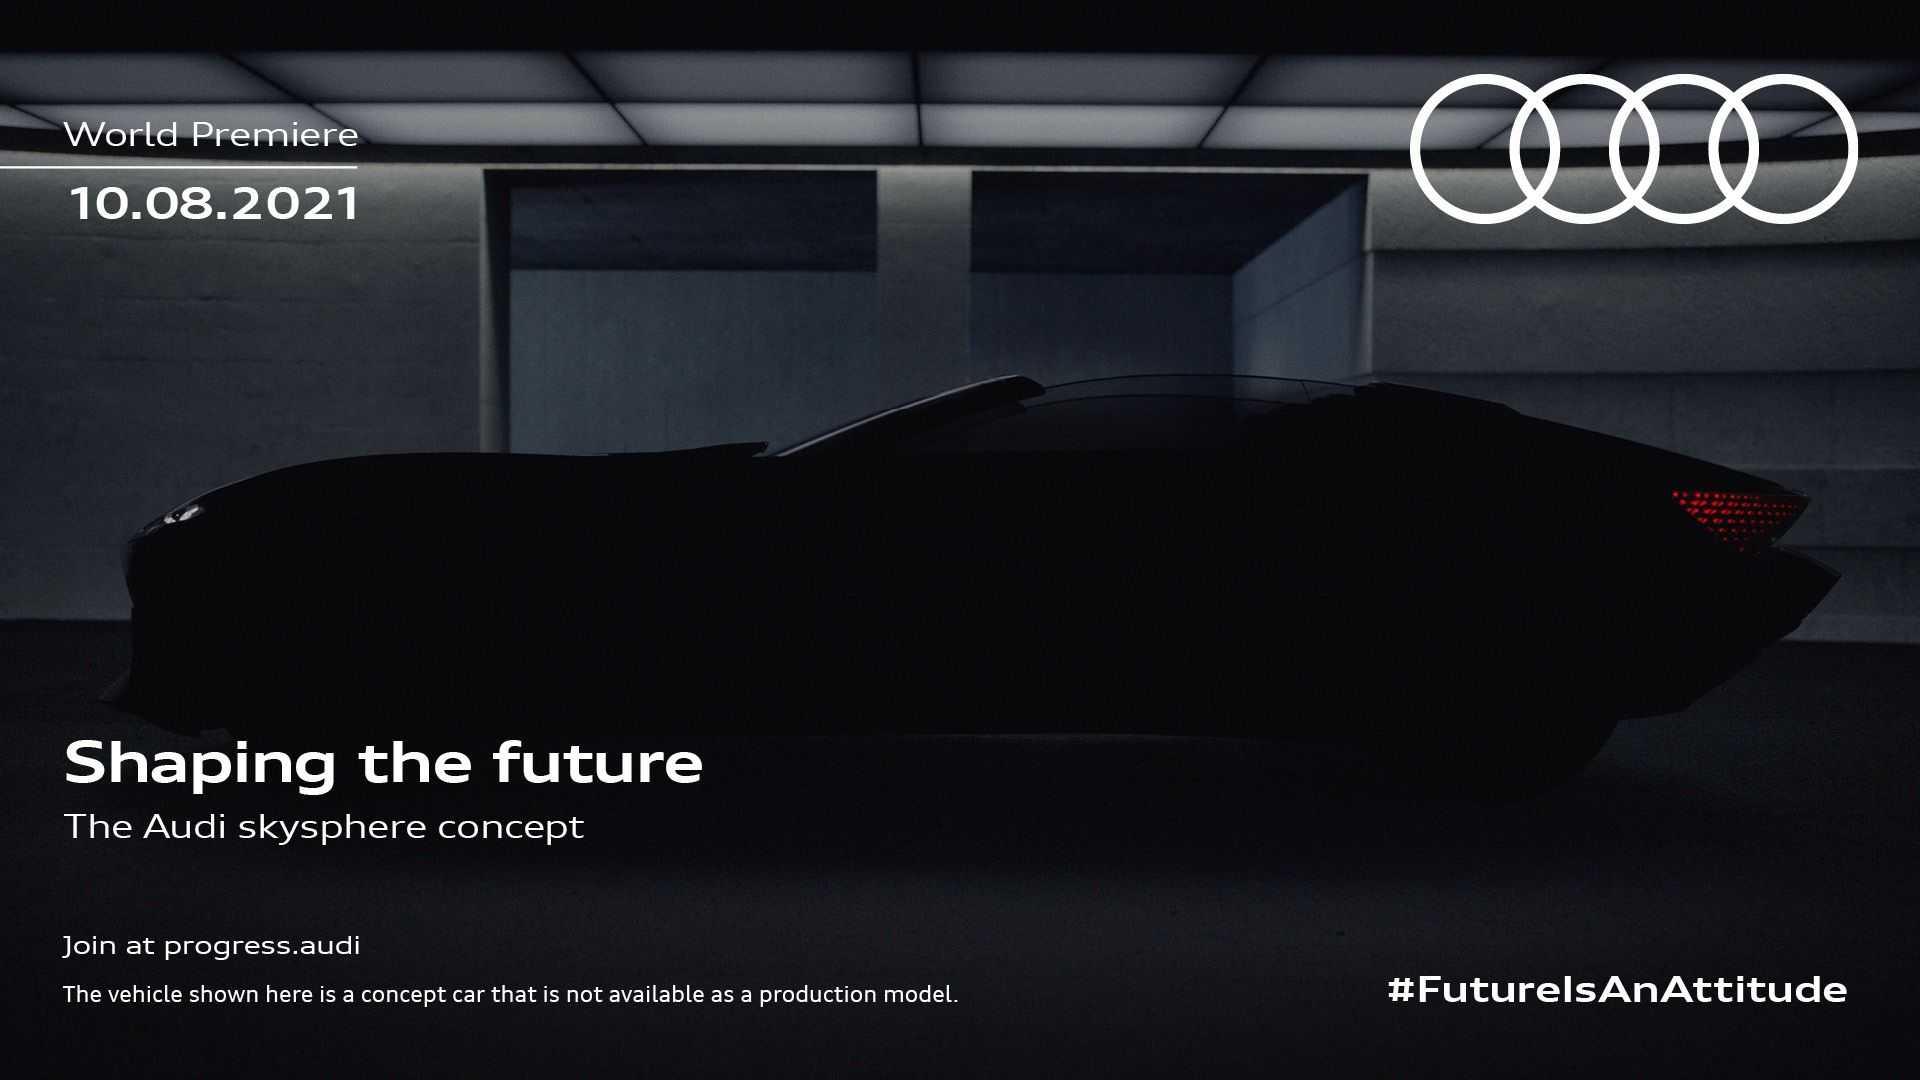 Audi-Sky-Sphere-Concept-teasers-4